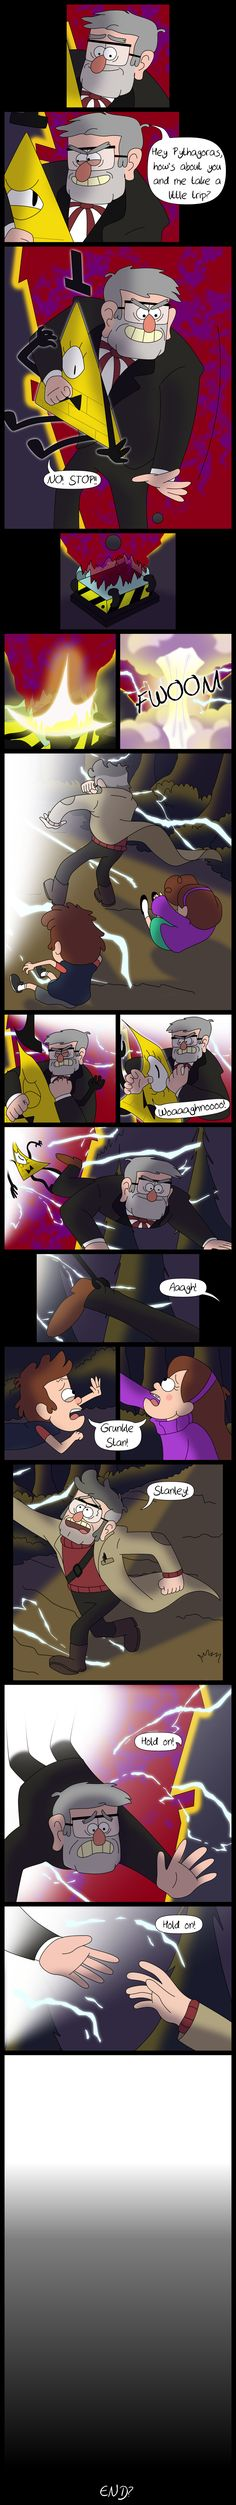 CHOICE - Page 4 -END- by Jaggid-Edge.deviantart.com on @DeviantArt